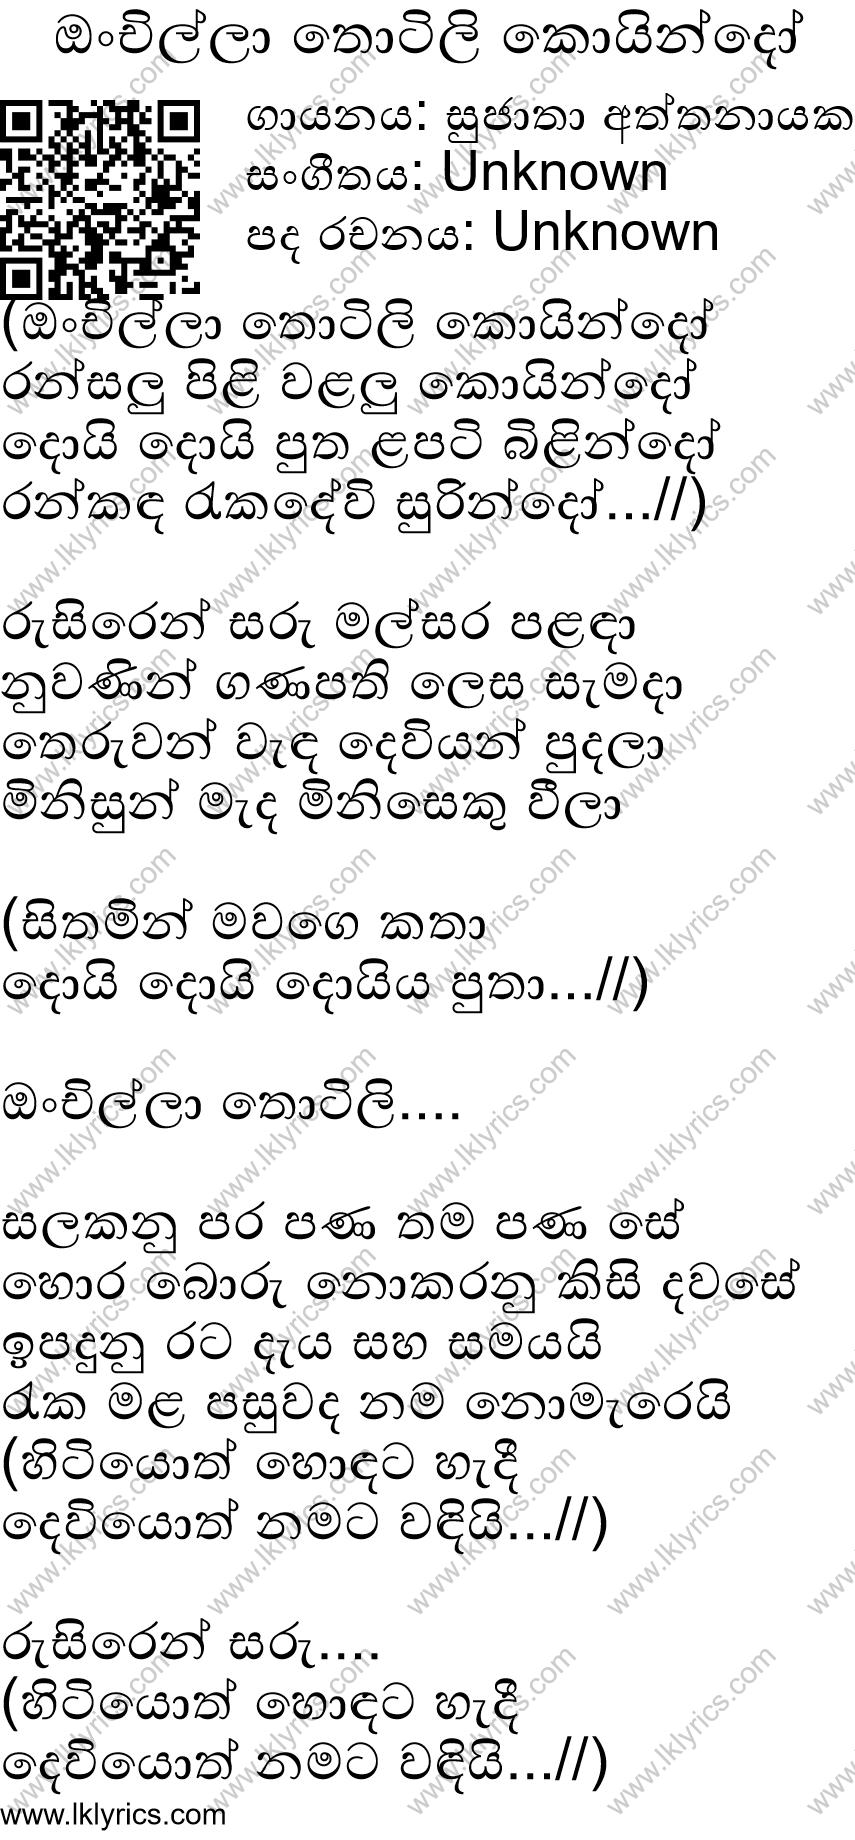 Sinhala midi songs